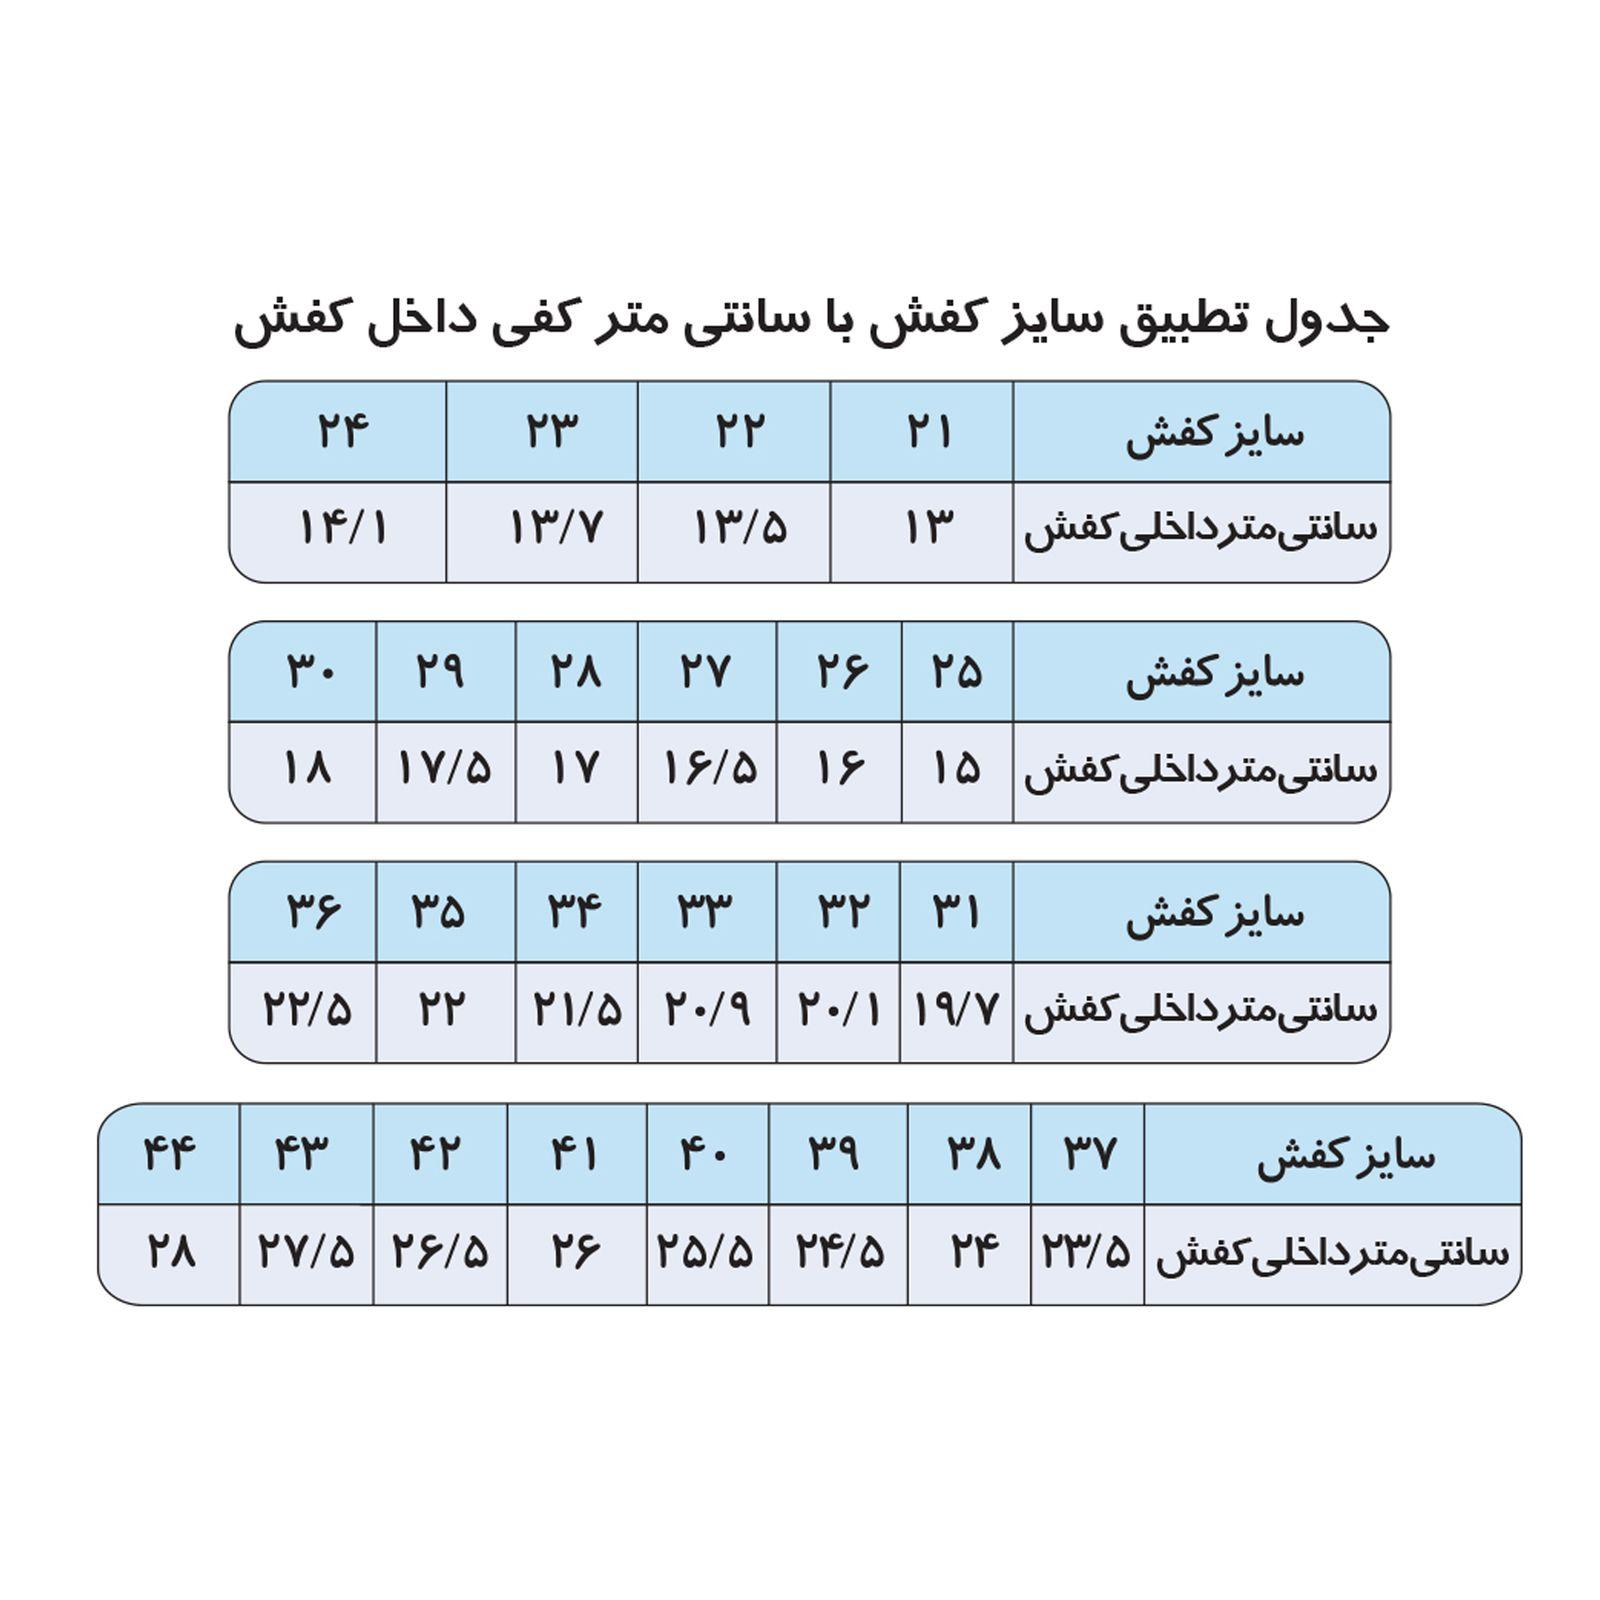 صندل مردانه مدل 8-1-EL101 -  - 8